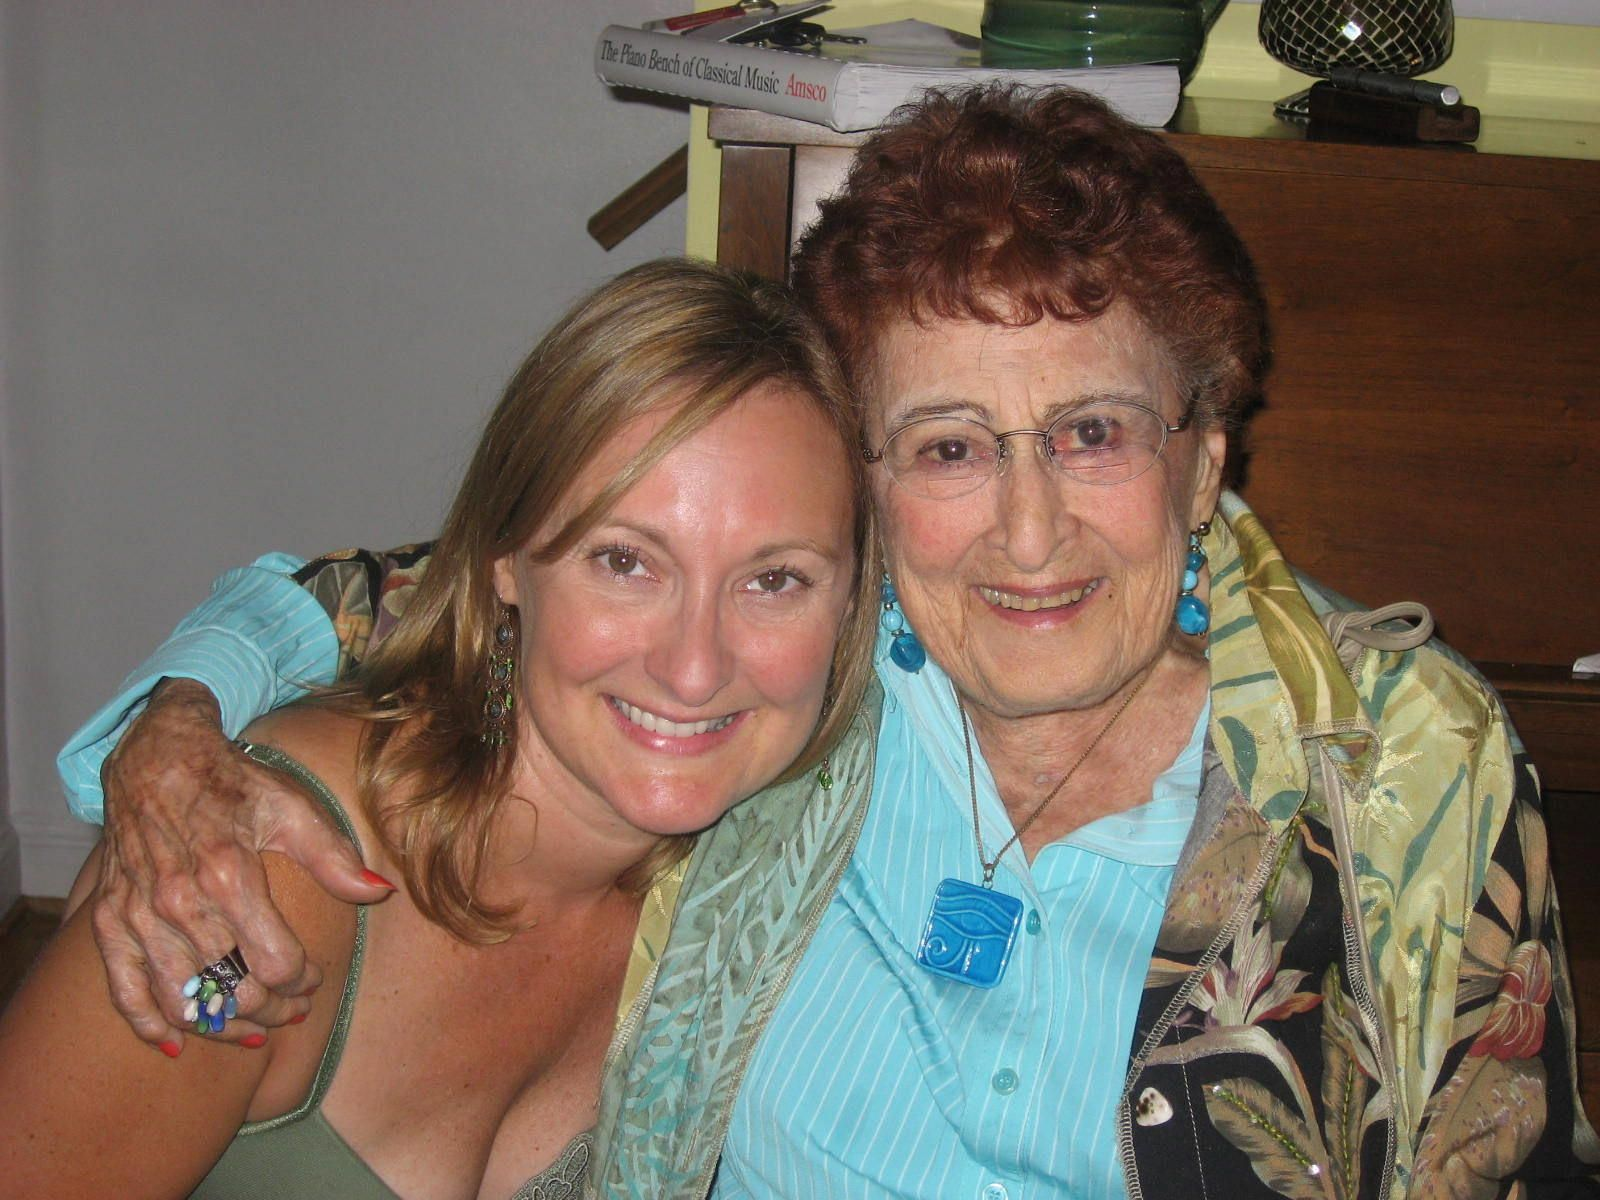 Anne Samaan Inspirational Caregiver Blazes the Trail